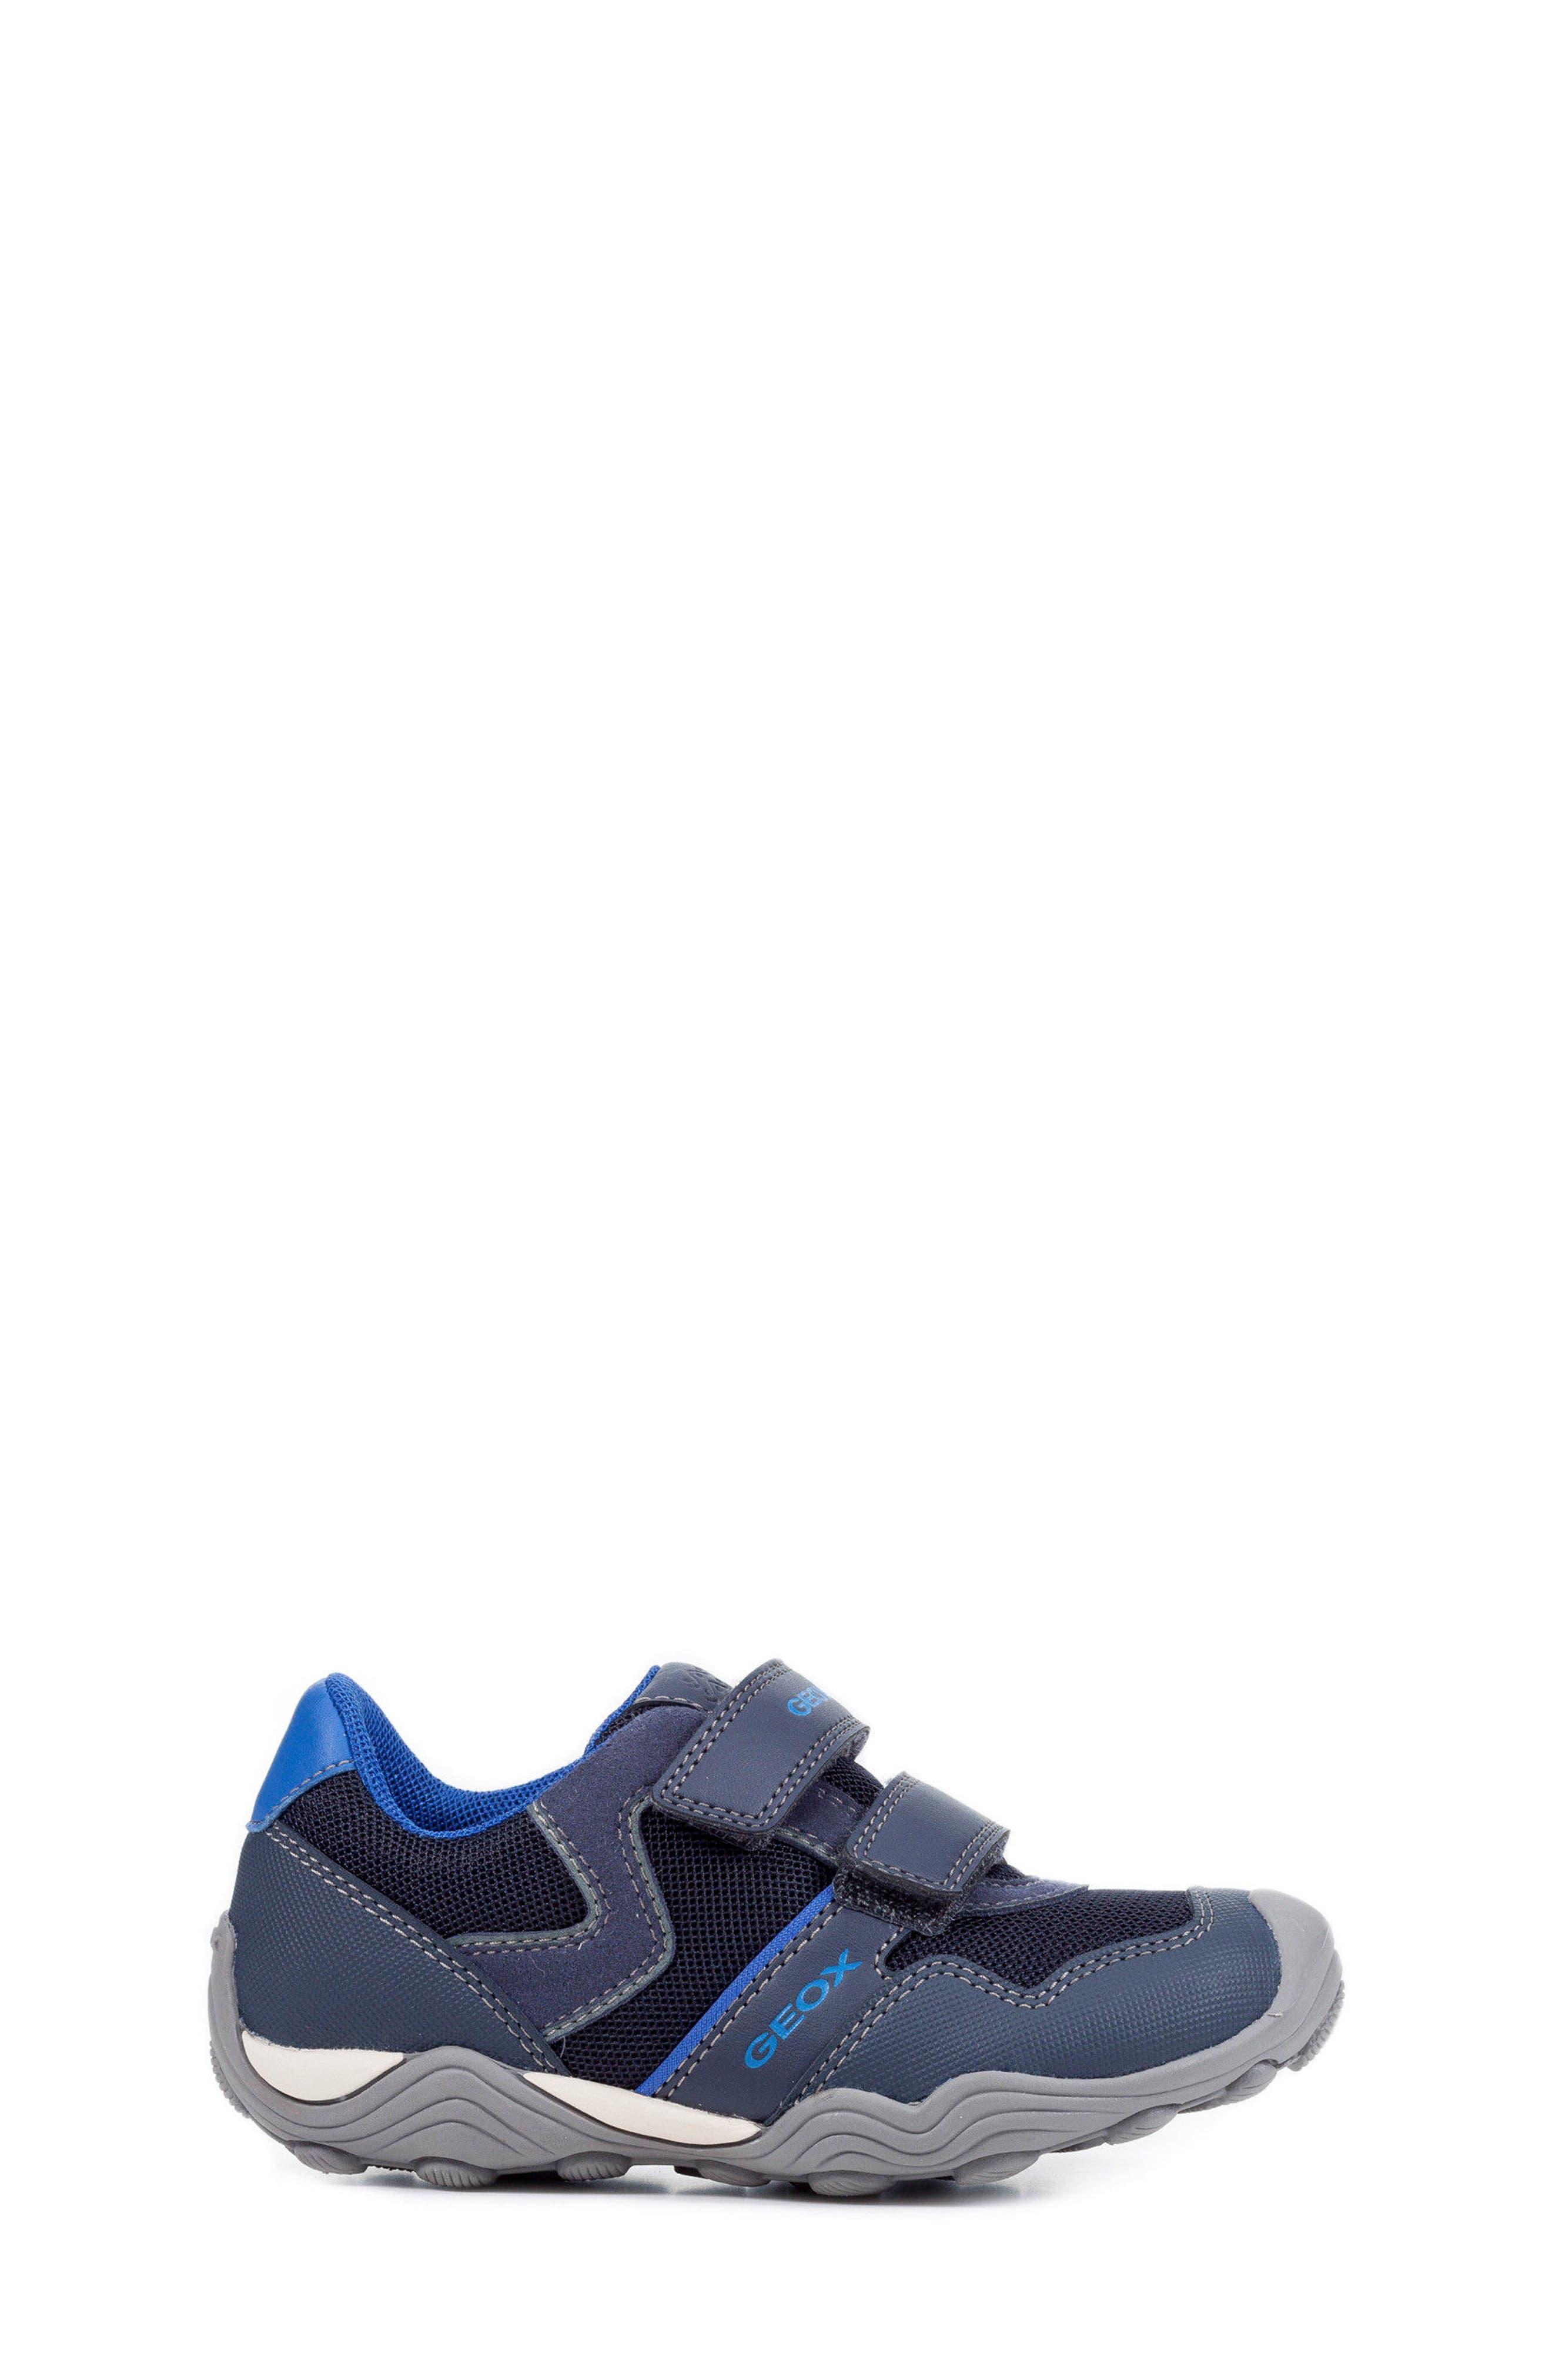 Jr Arno 13 Sneaker,                             Alternate thumbnail 3, color,                             Navy/ Royal Blue